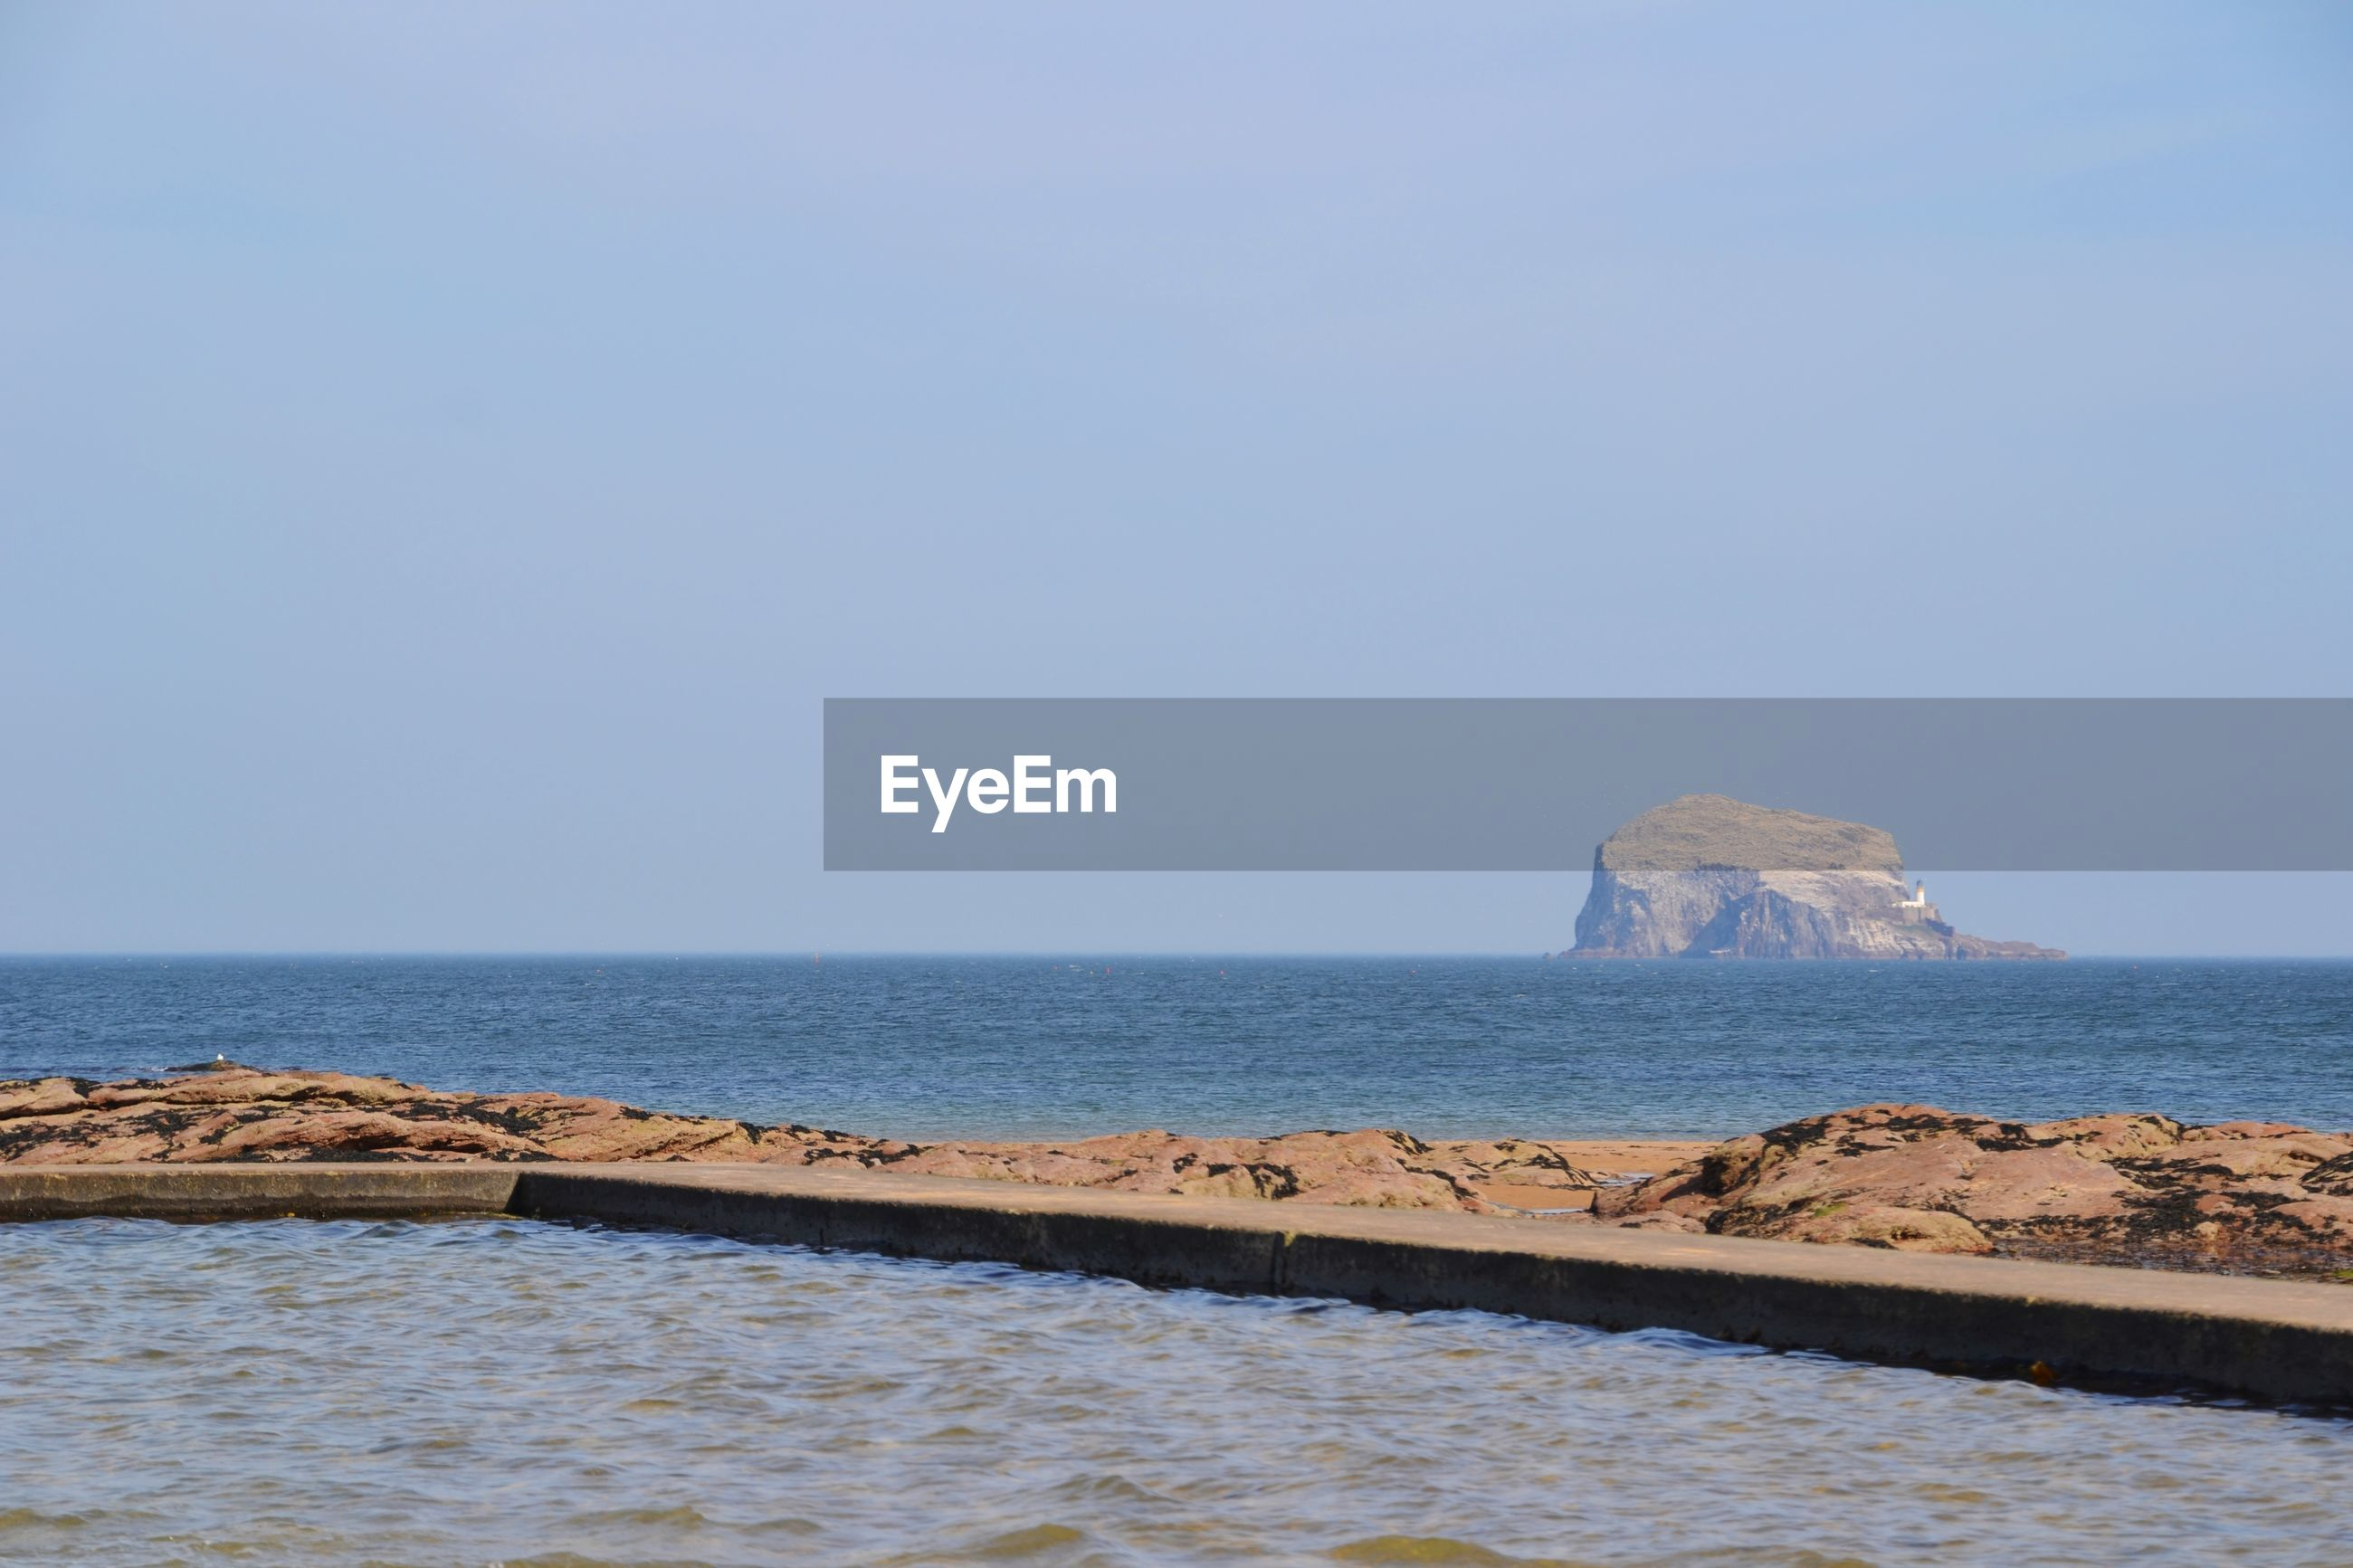 Scenic view of island in sea